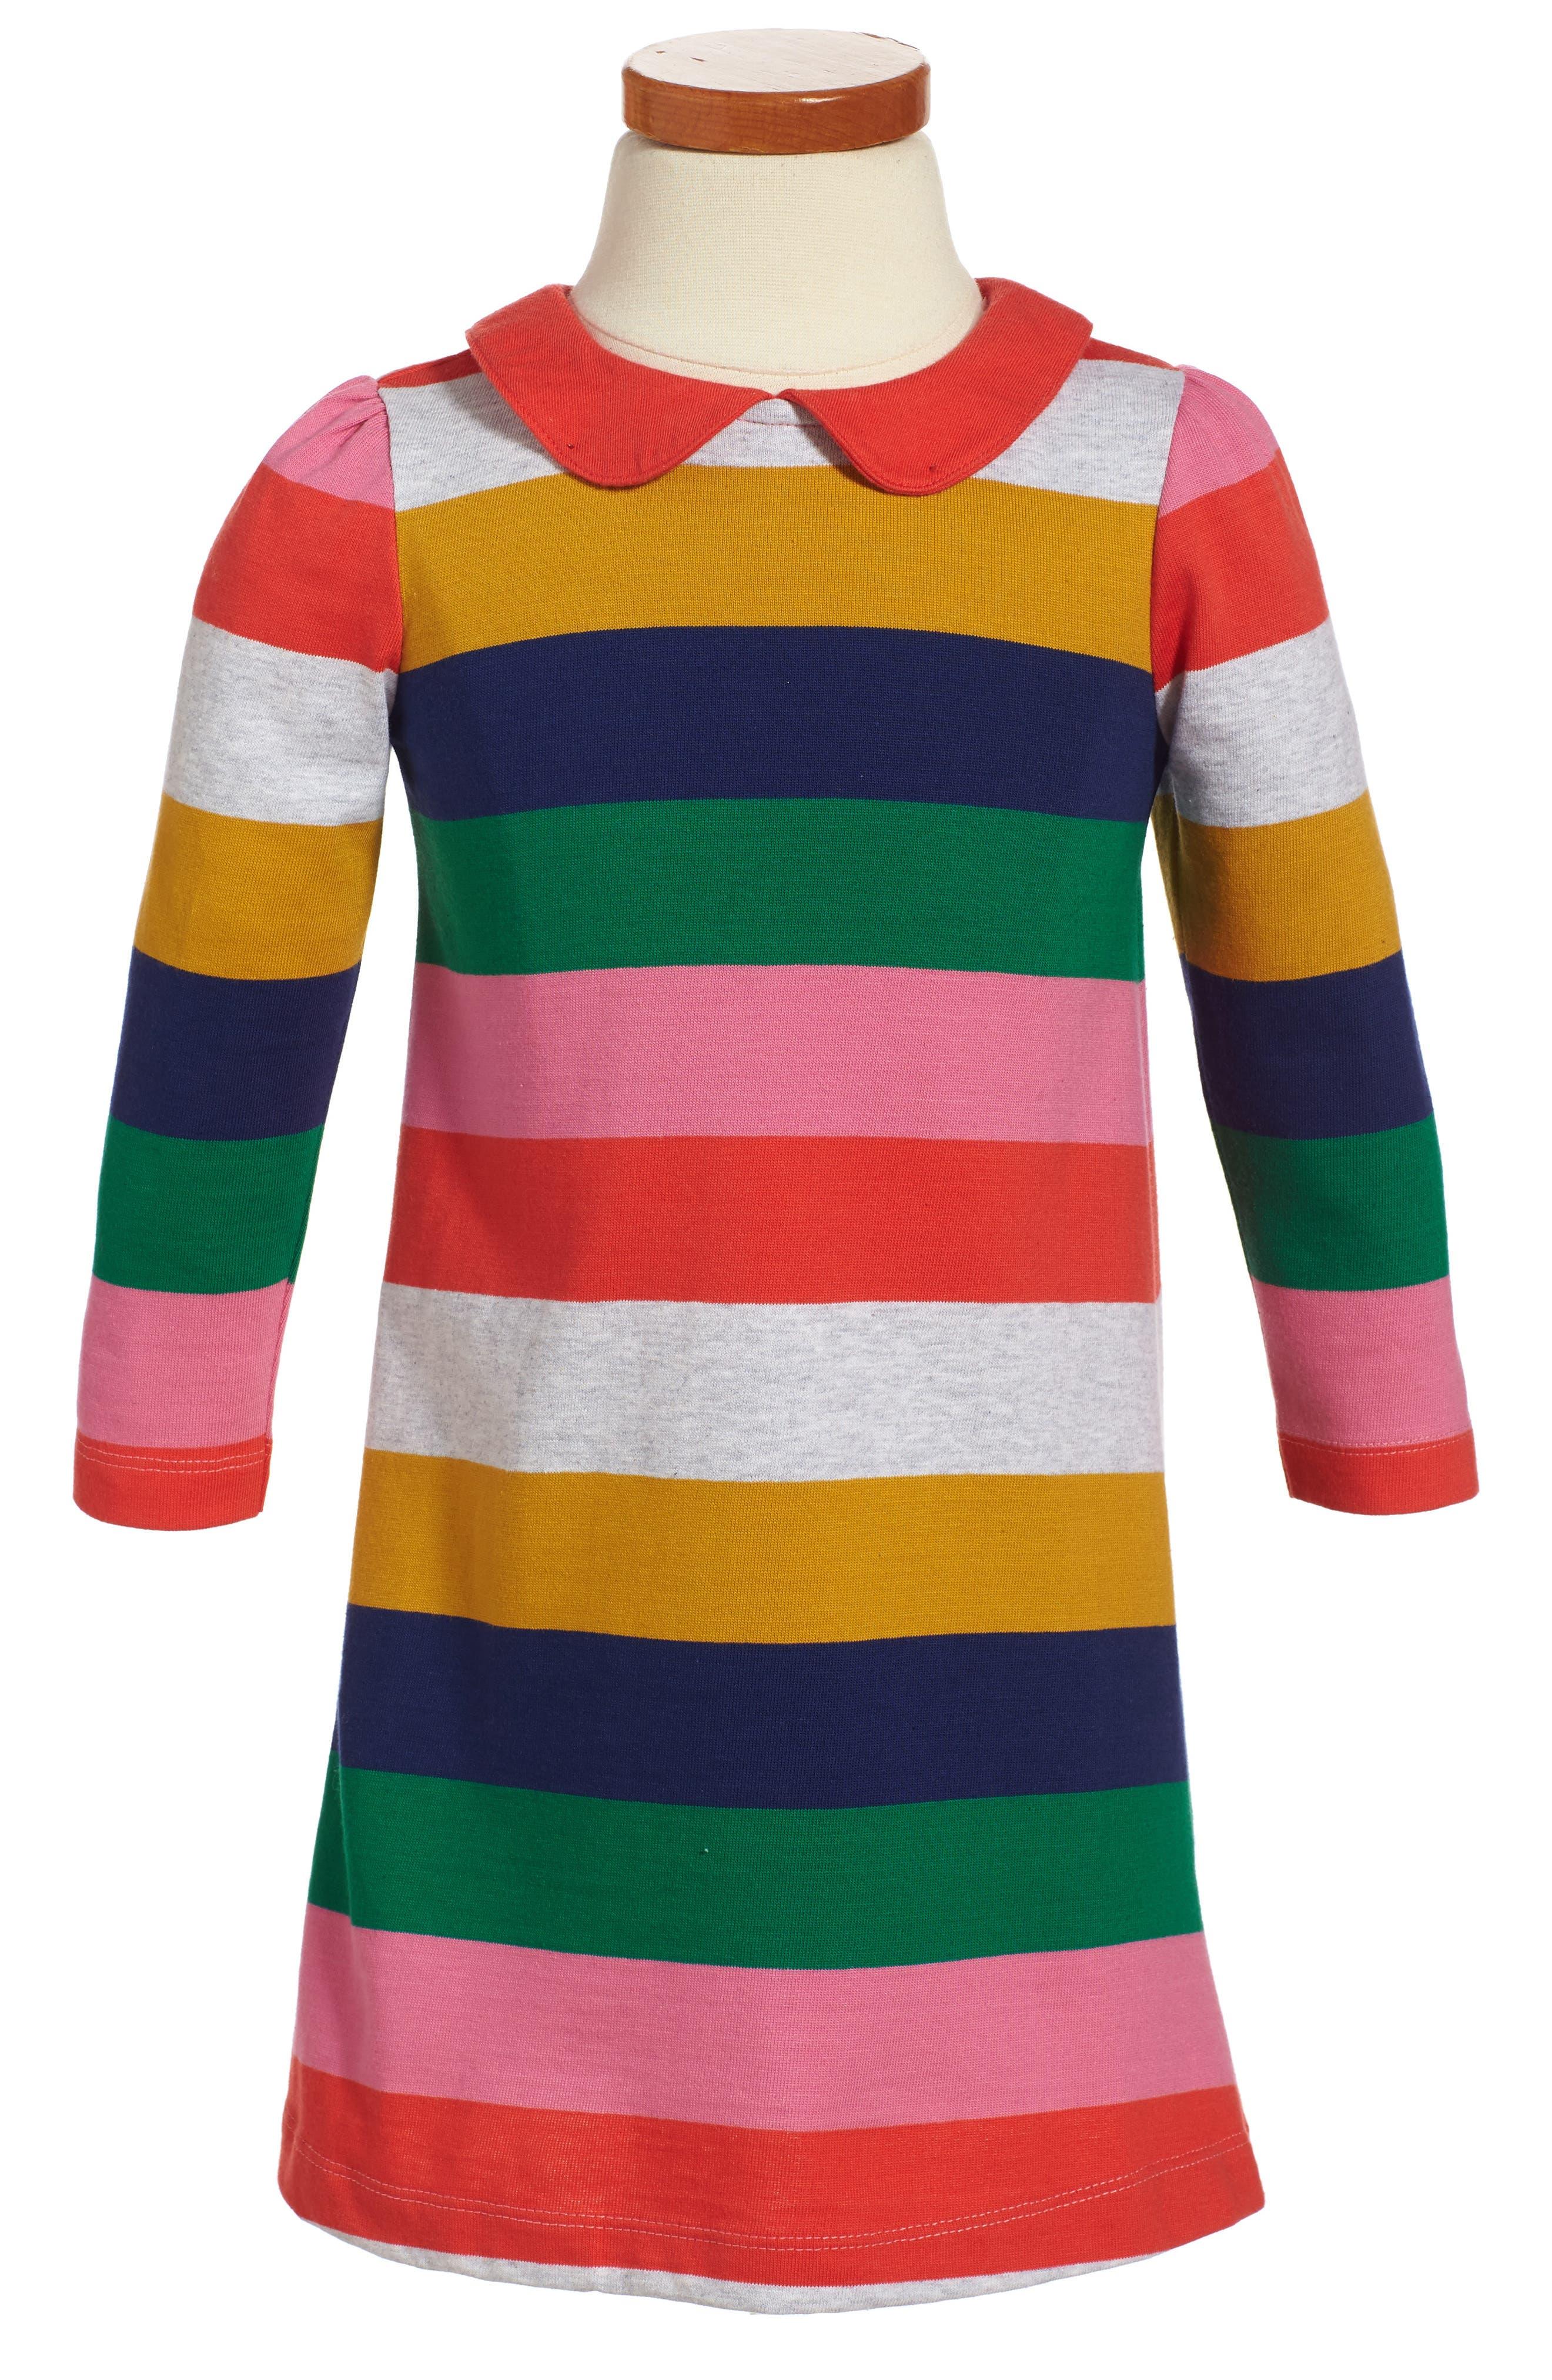 Alternate Image 1 Selected - Mini Boden Collared Jersey Dress (Toddler Girls, Little Girls & Big Girls)